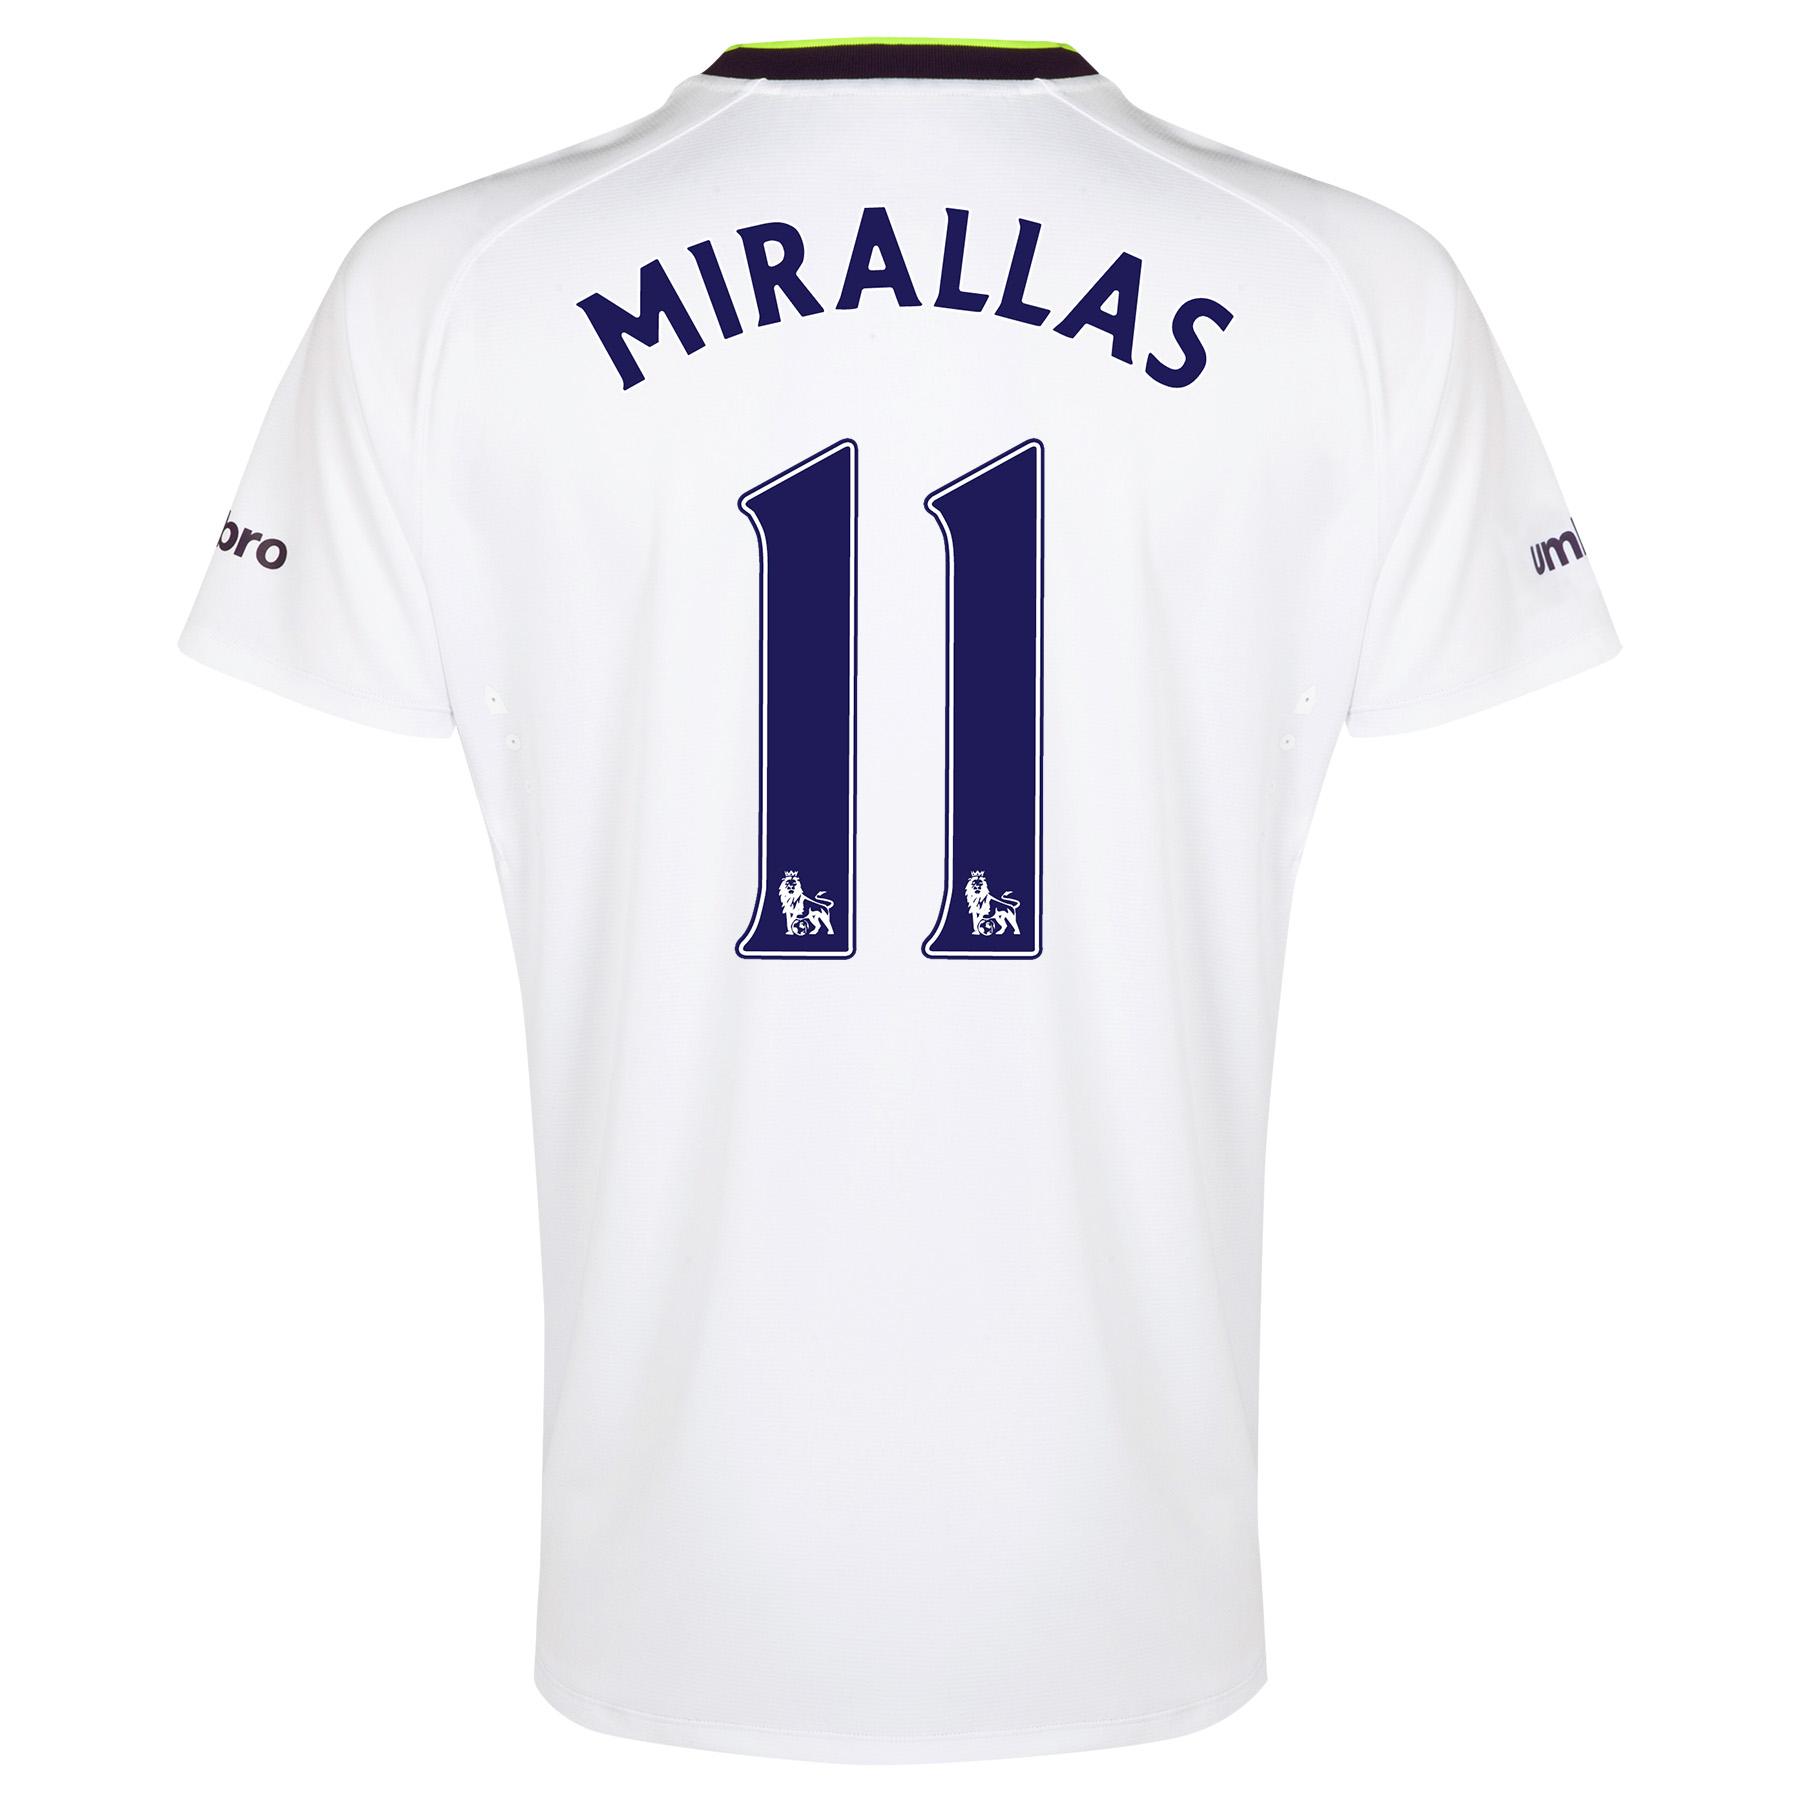 Everton SS 3rd Shirt 2014/15 - Junior with Mirallas 11 printing